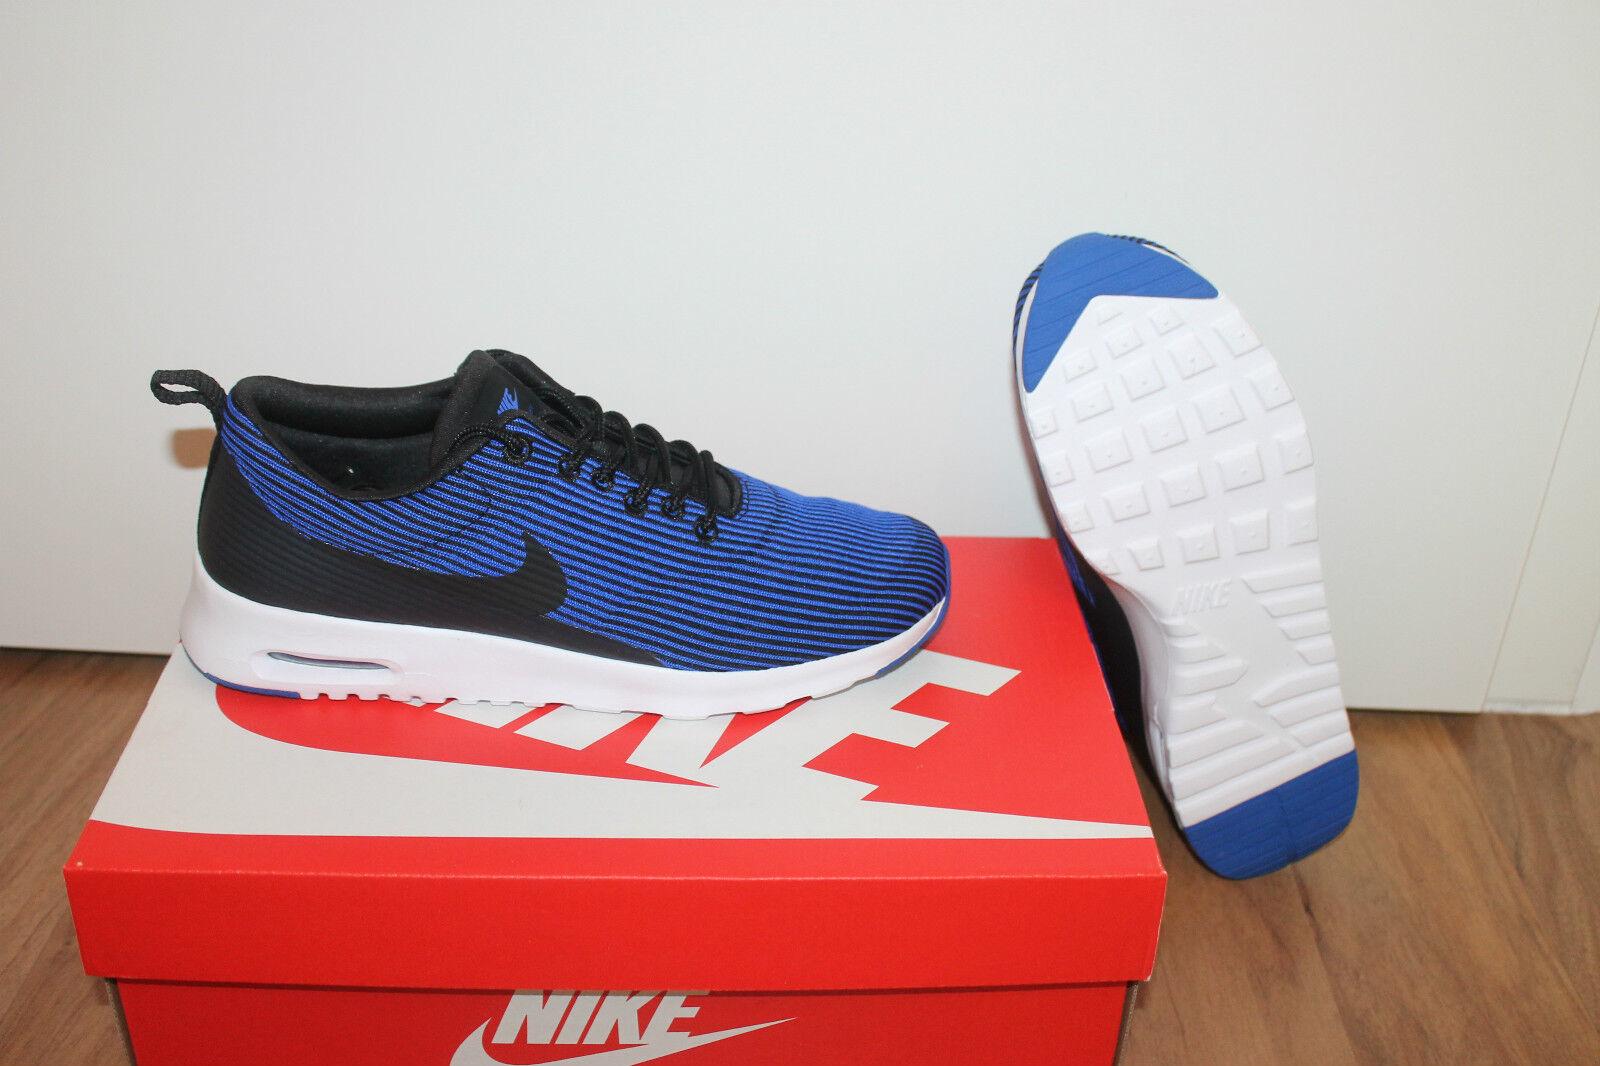 Zapatos promocionales para hombres y mujeres Nike Air Max Thea Damen Running Schuhe Blau Weiß alle Größen Neu mit Karton